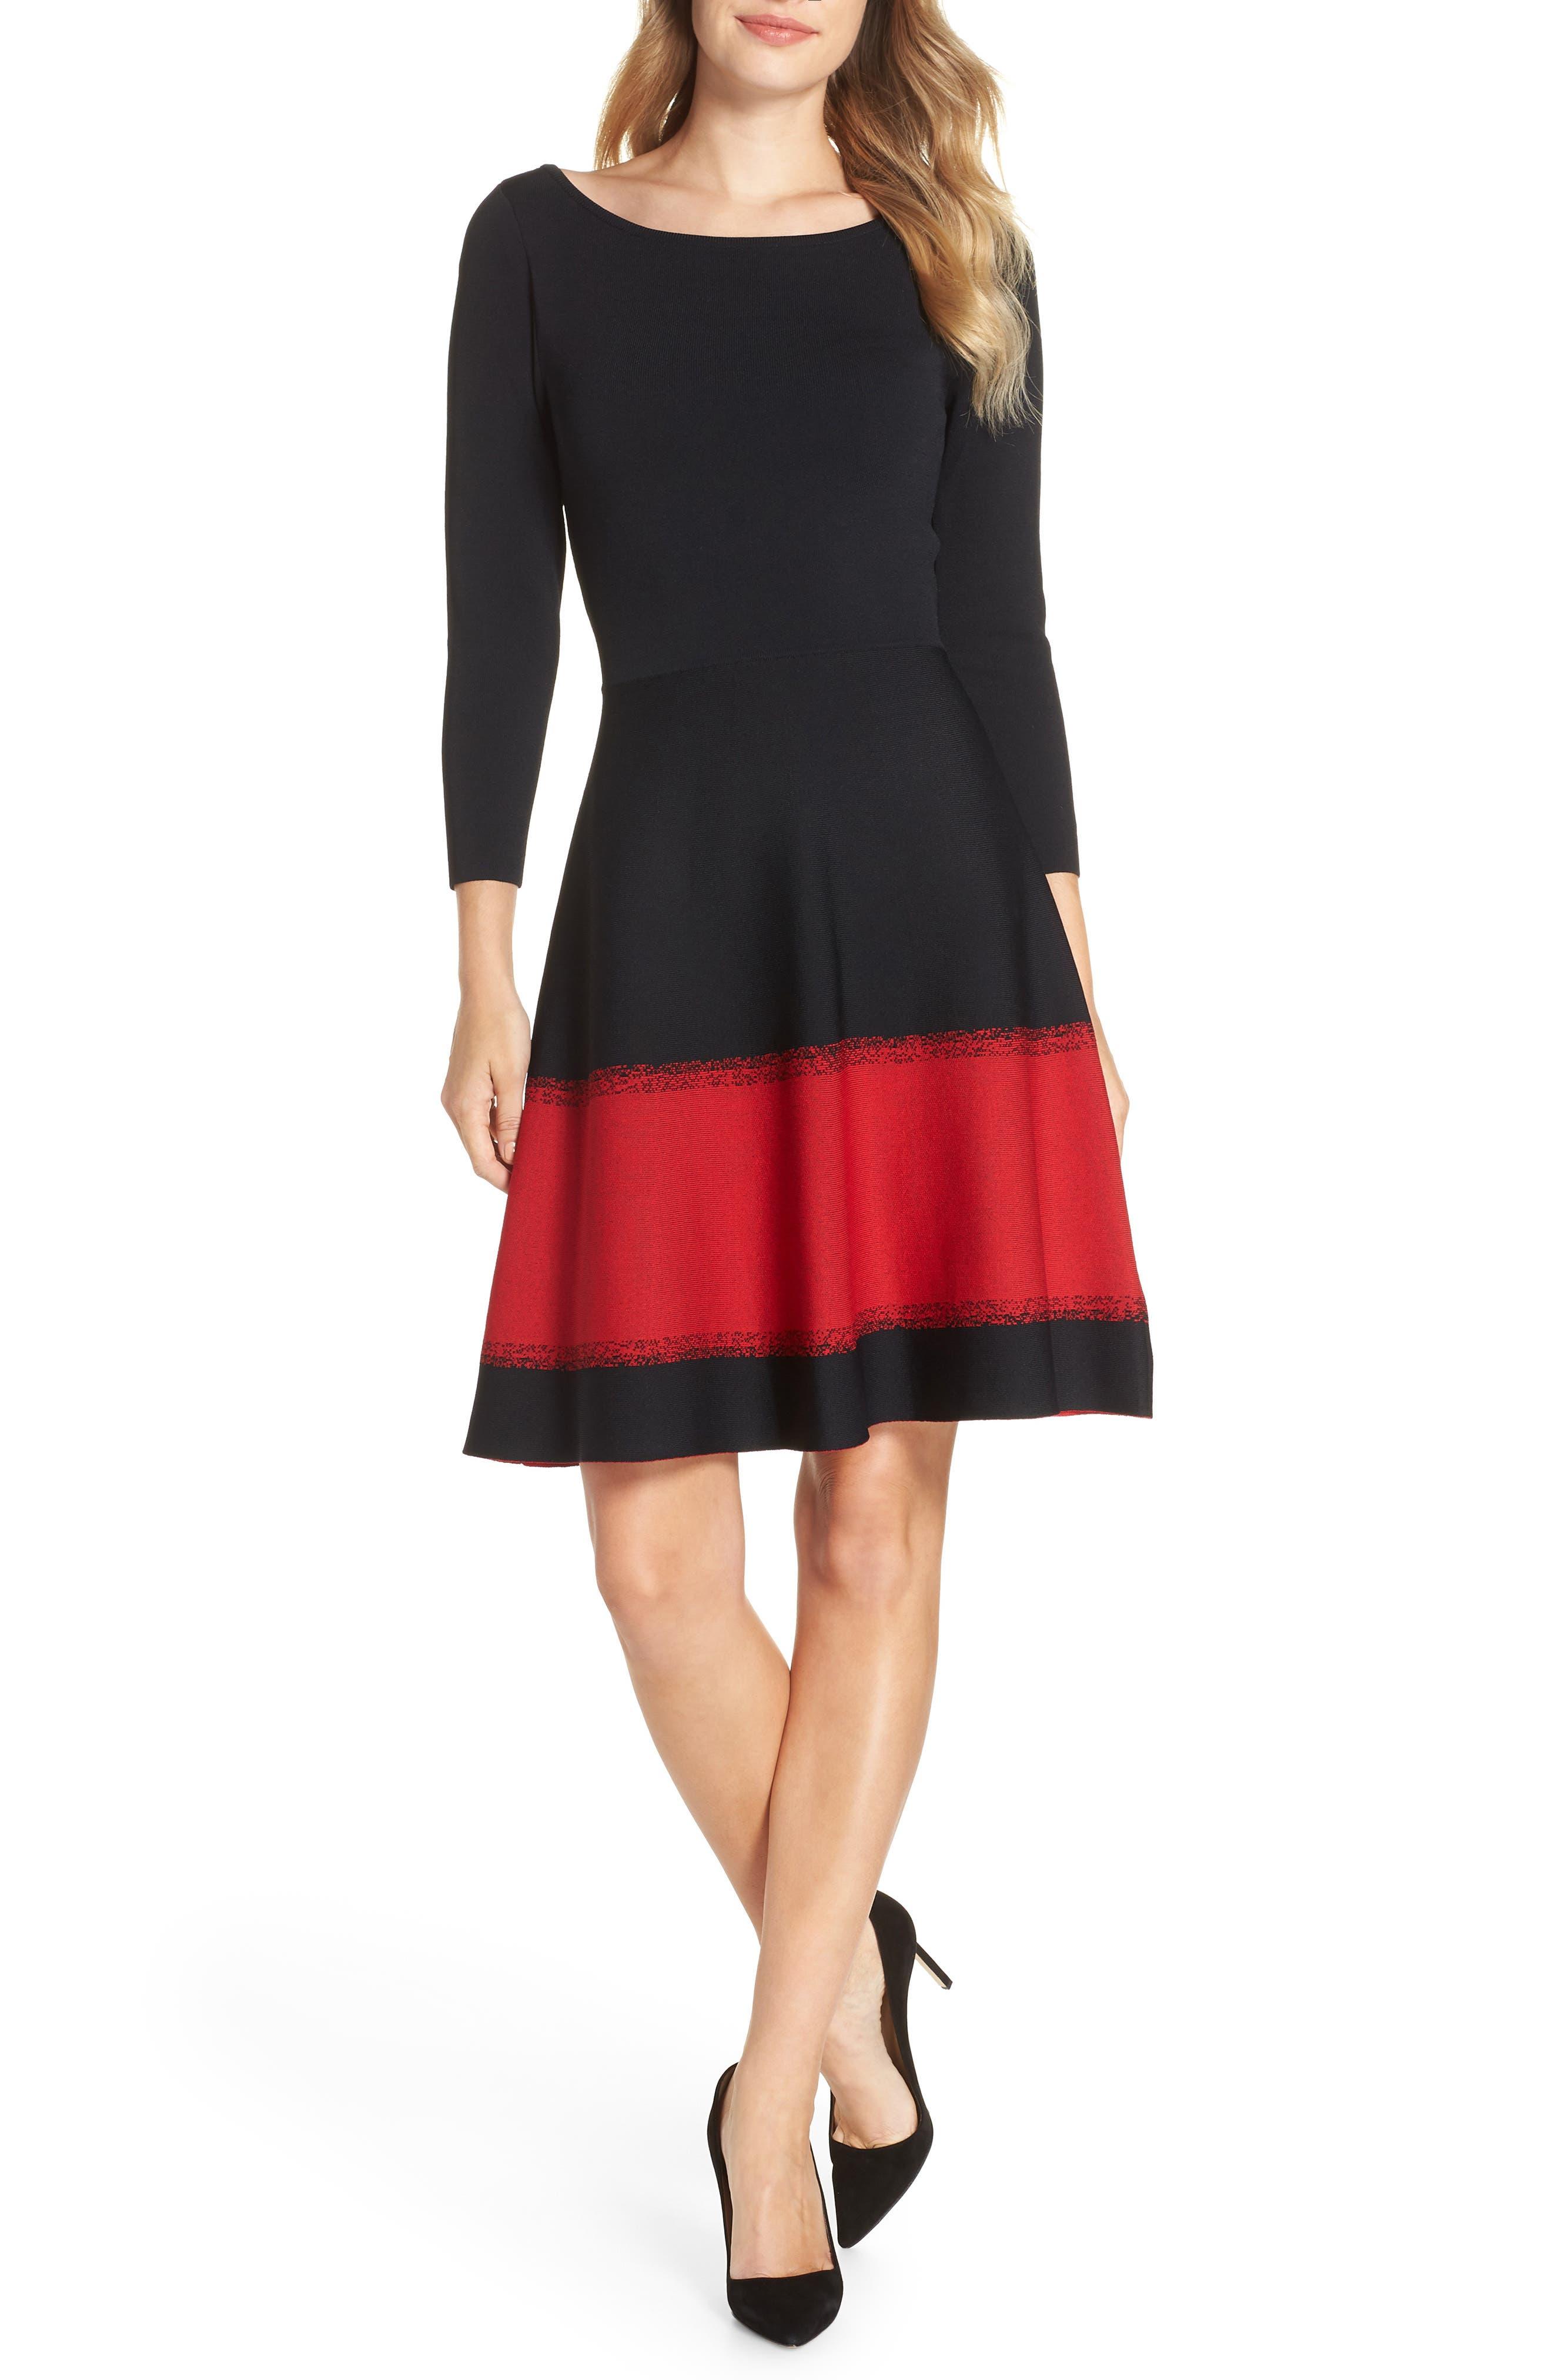 ELIZA J, Contrast Stripe Fit & Flare Dress, Main thumbnail 1, color, 001